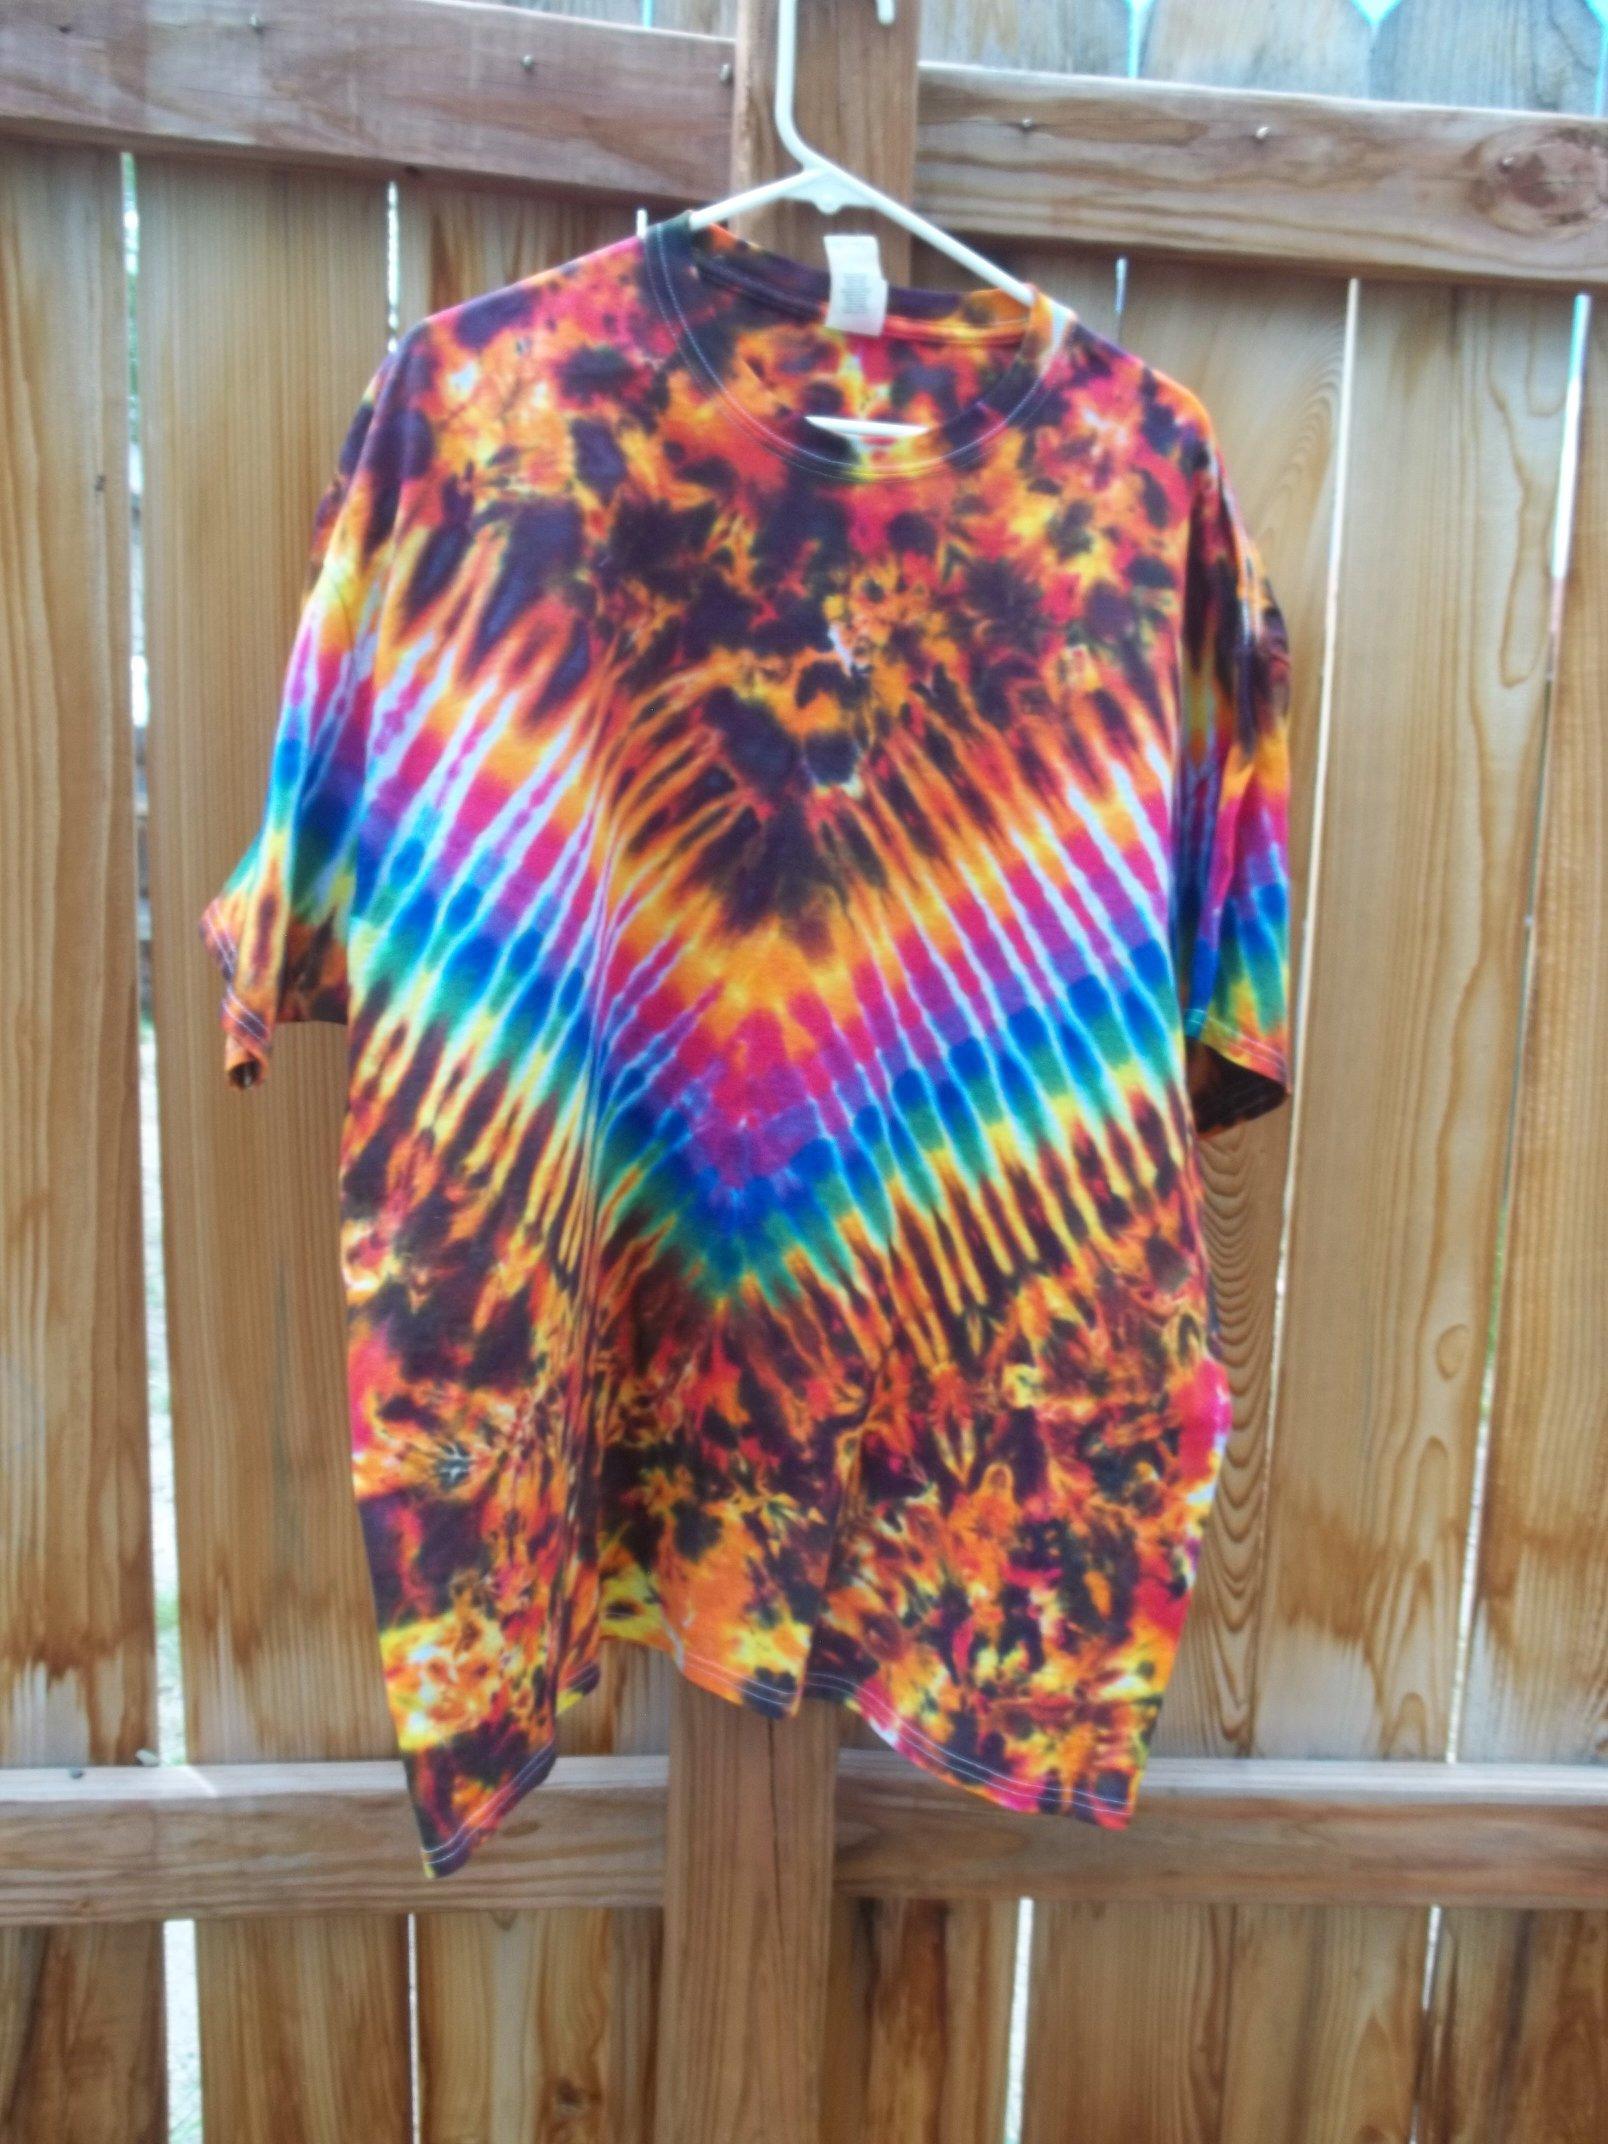 XXL Short Sleeve Fire Tie Dye   Facebook